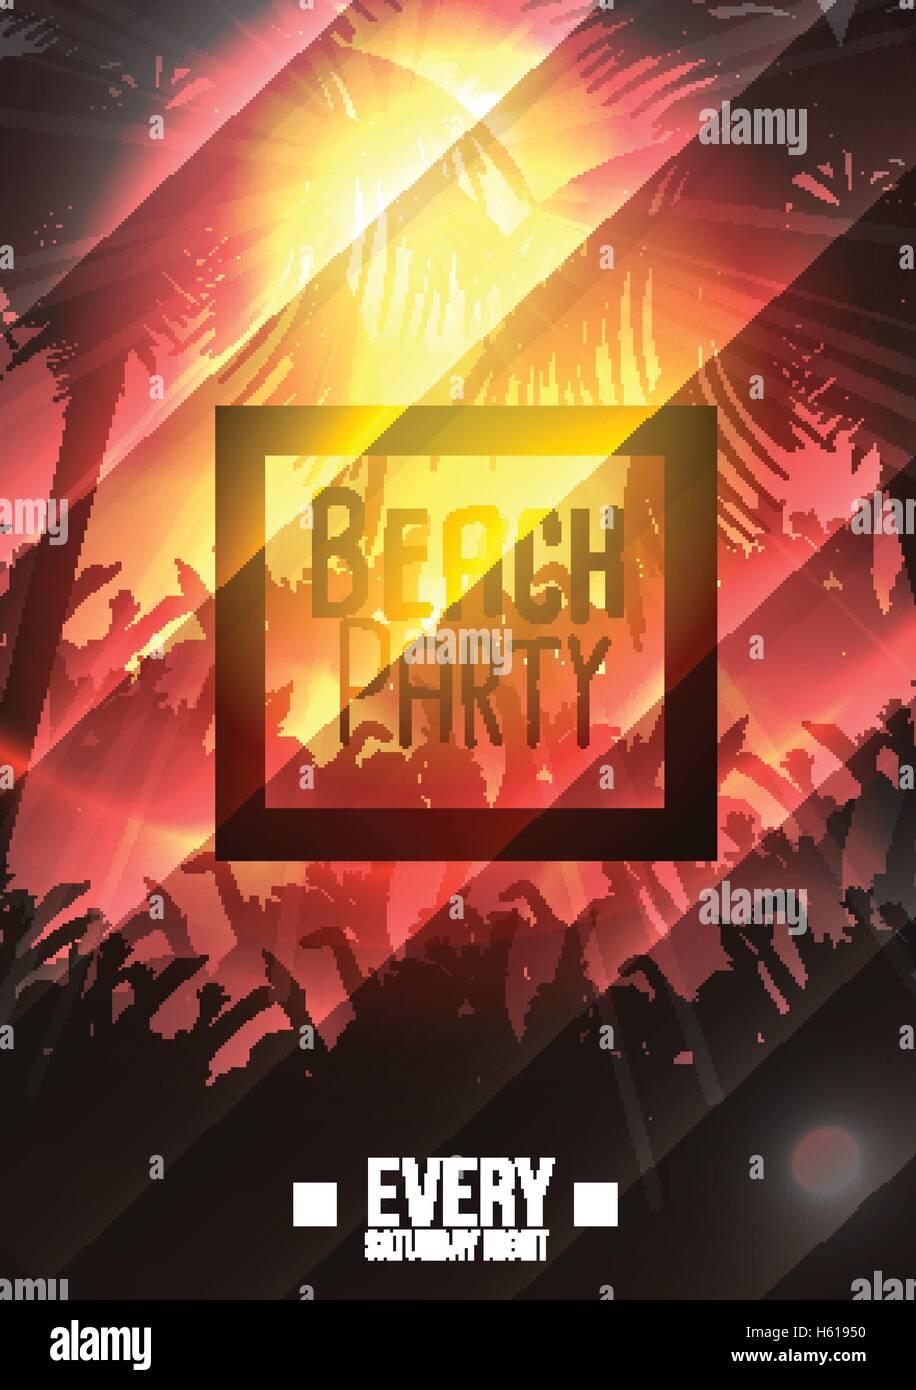 Summer Beach Party Flyer Template Stockfotos & Summer Beach Party ...